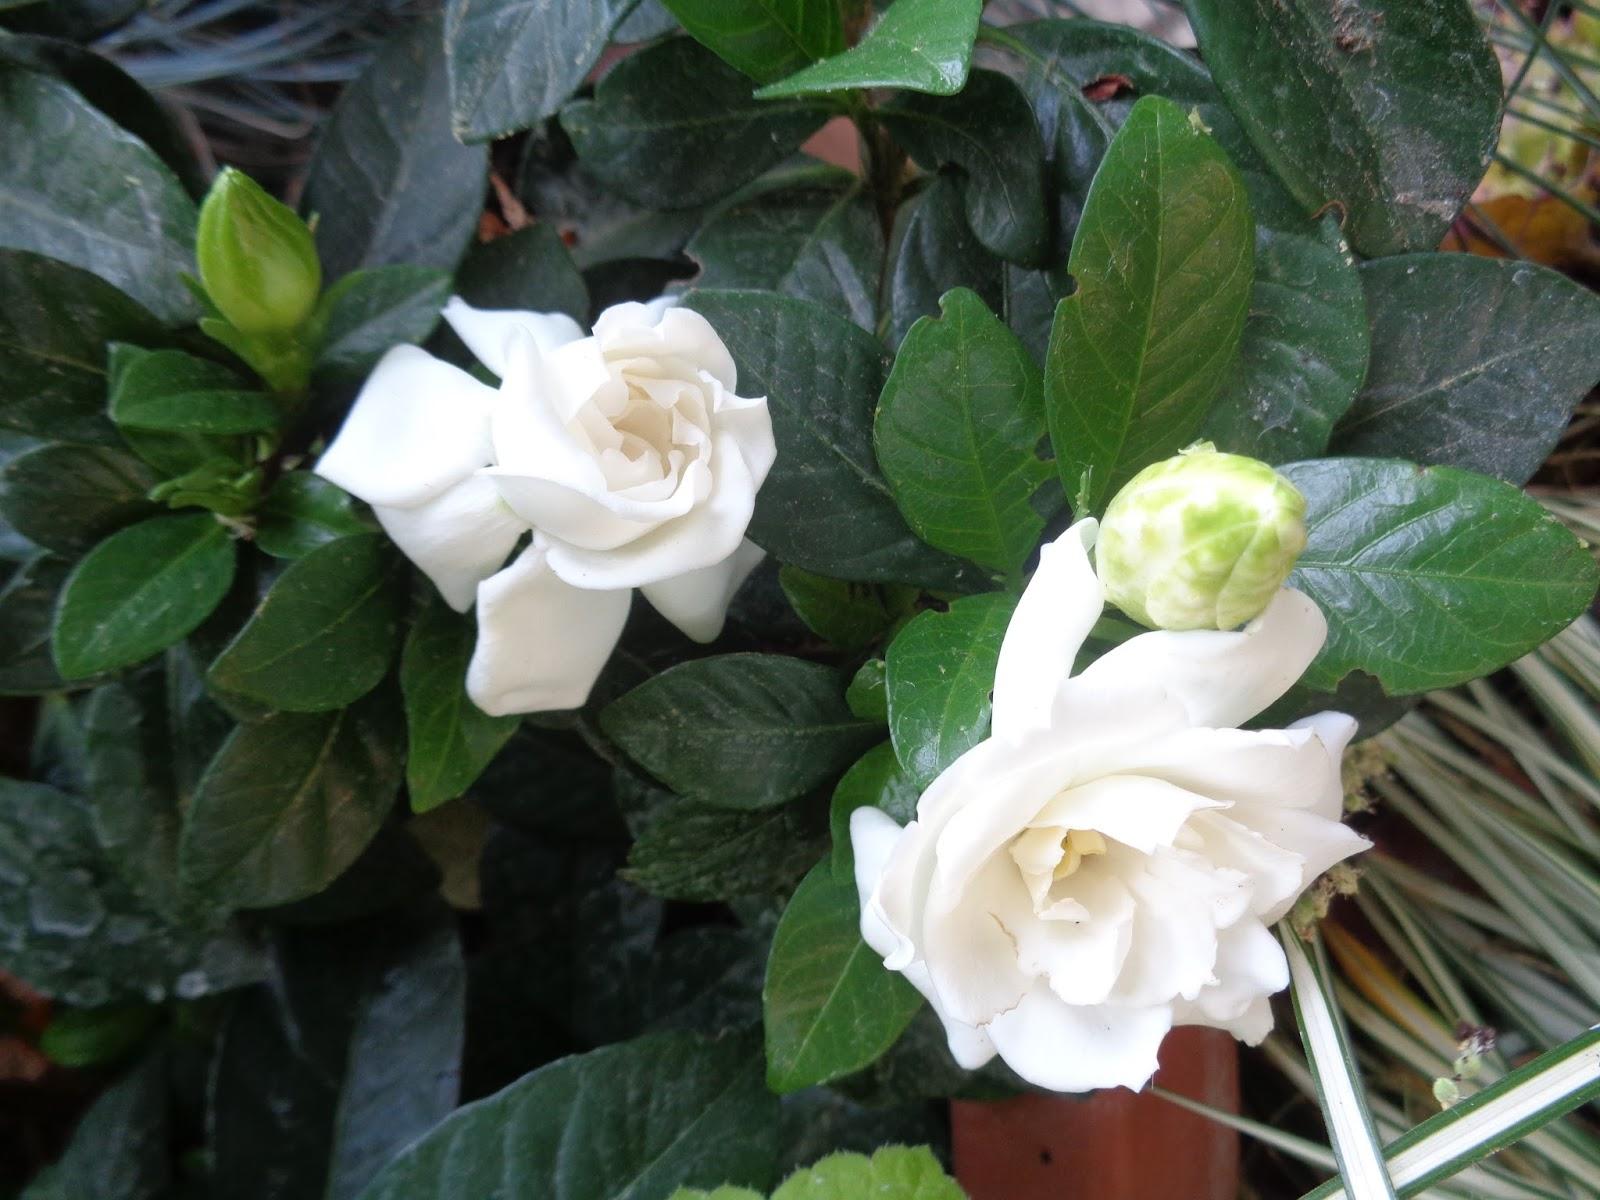 Gardenia Pianta Da Esterno O Interno - The Studio Apartments